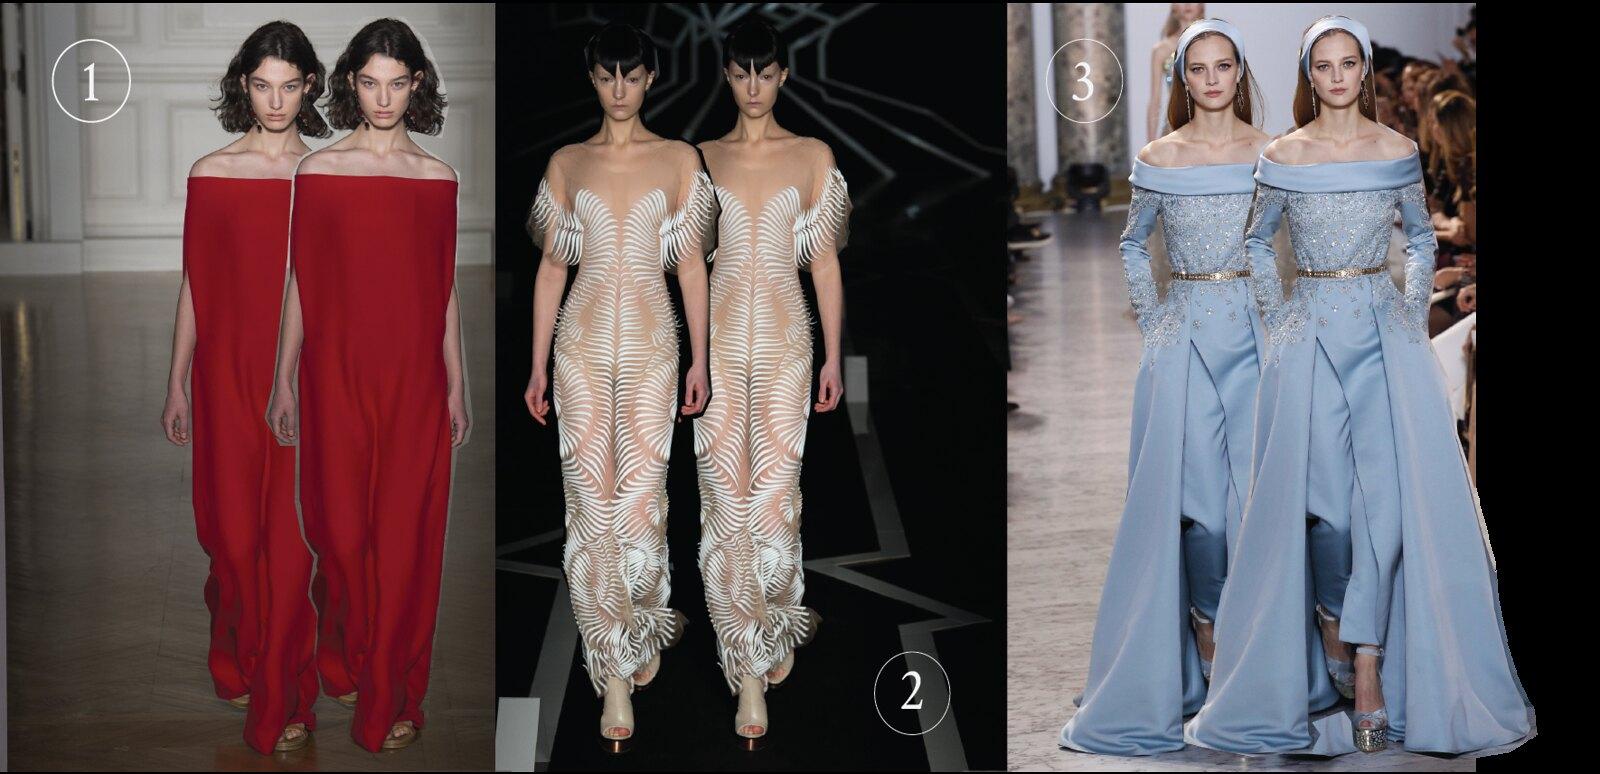 París Haute Couture 2017 en Oddcatrina.com